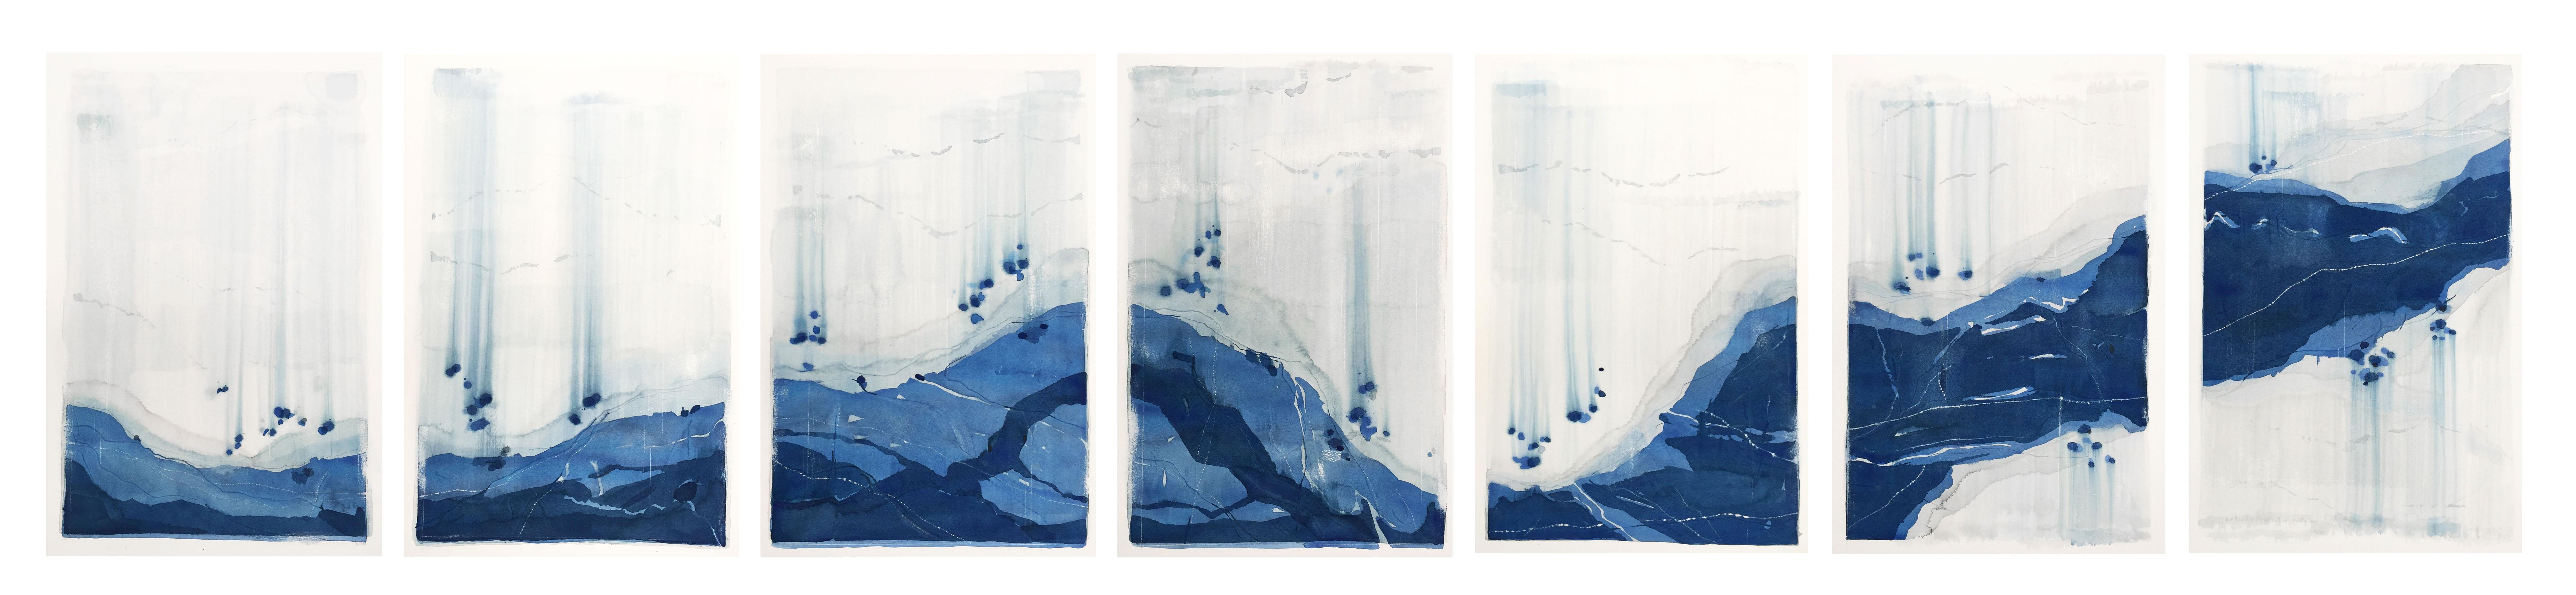 Stefan Gevers_Blue River_watercolour_76x